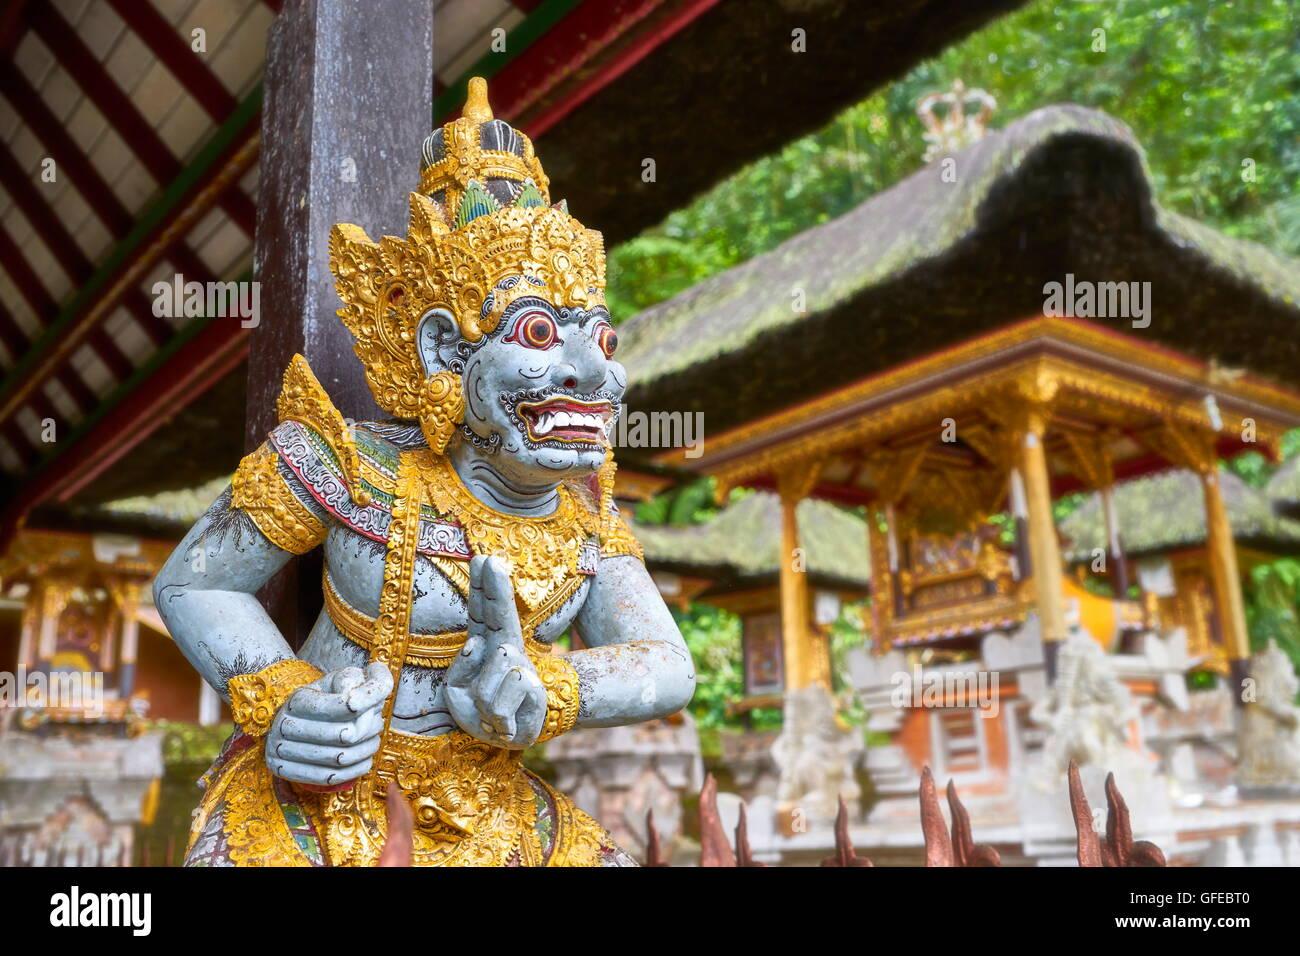 Estatua de Dios en pura Templo Gunung Kawi, Bali, Indonesia Imagen De Stock